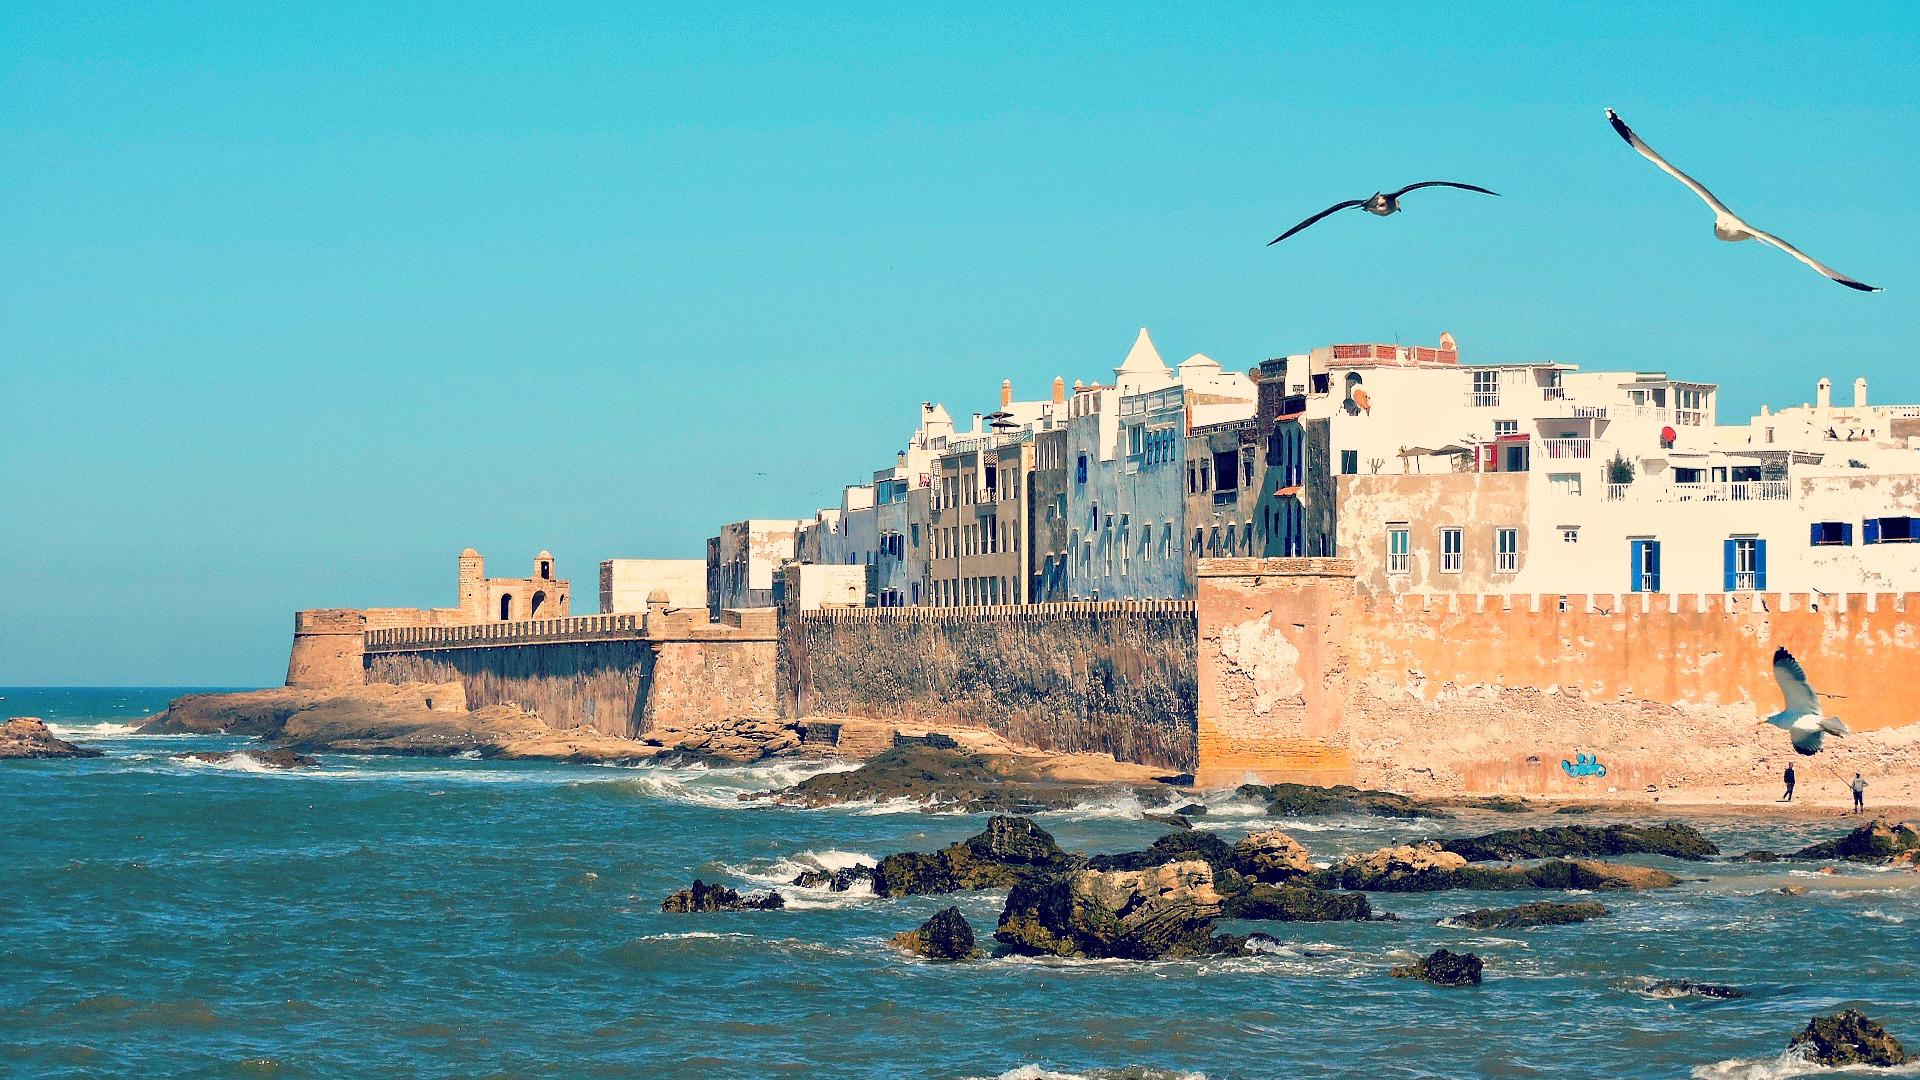 From Marrakech to Essaouira Mogador